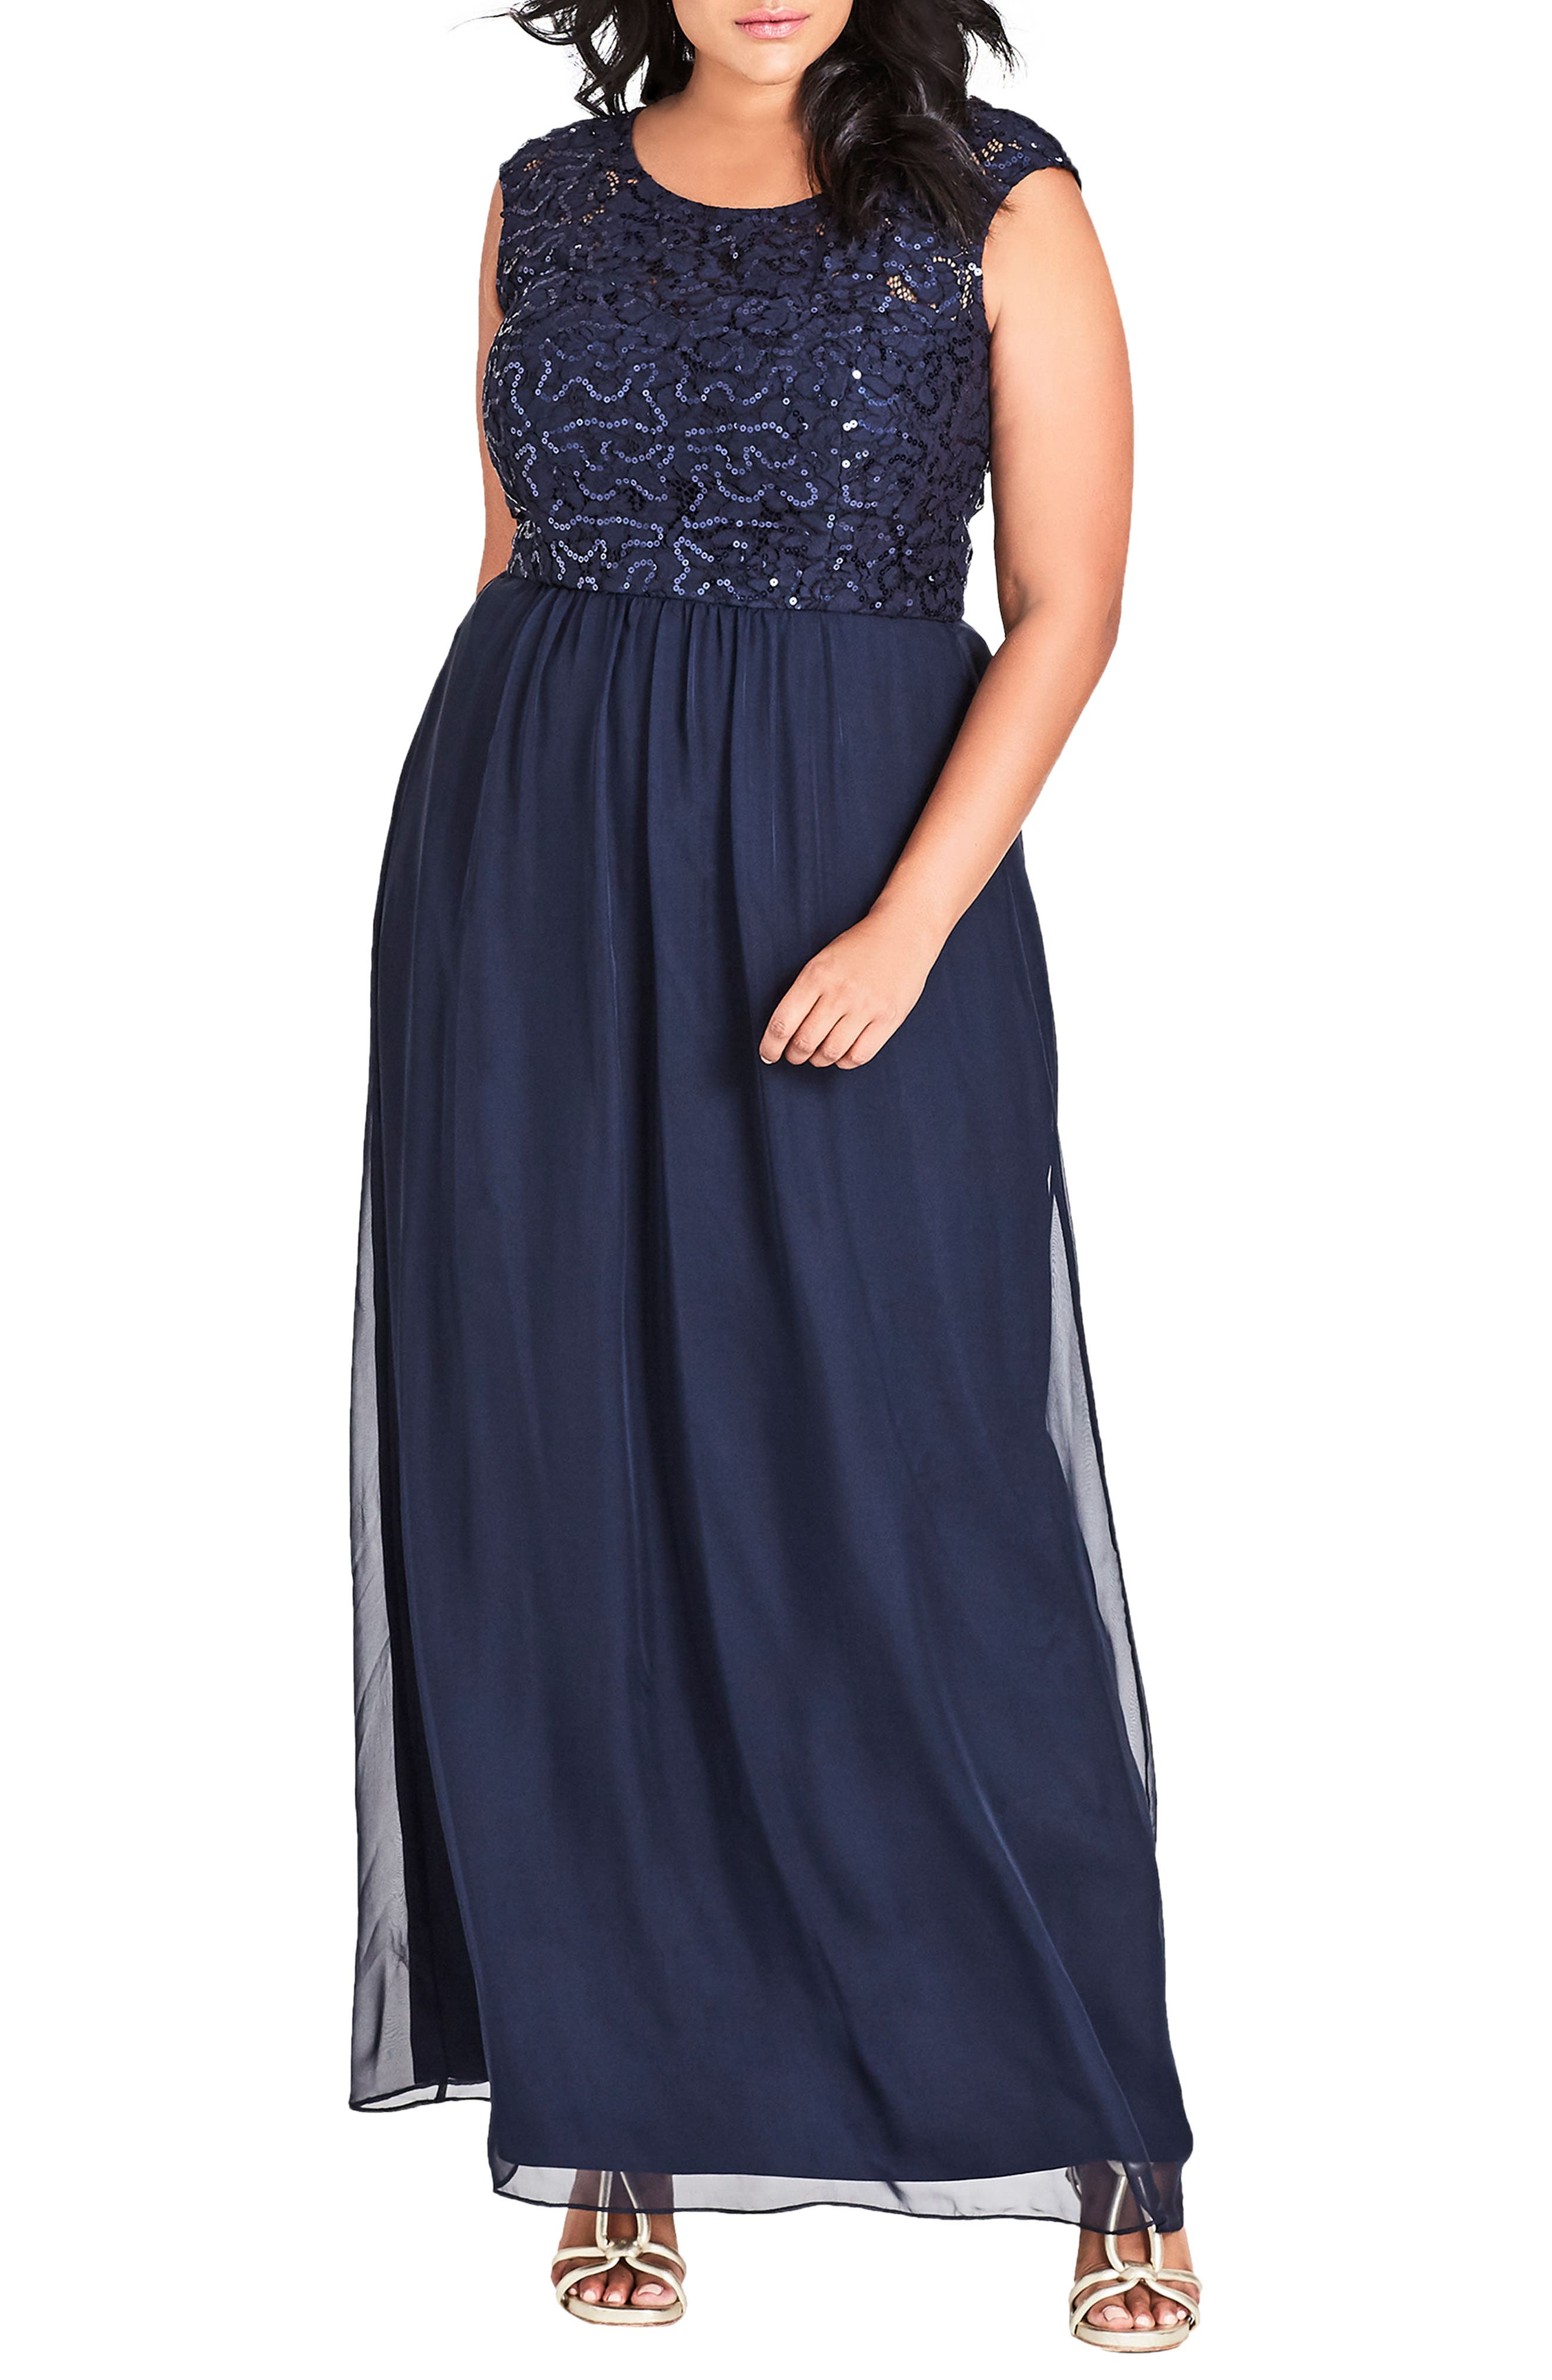 Sweet Love Maxi Dress,                             Main thumbnail 1, color,                             Navy